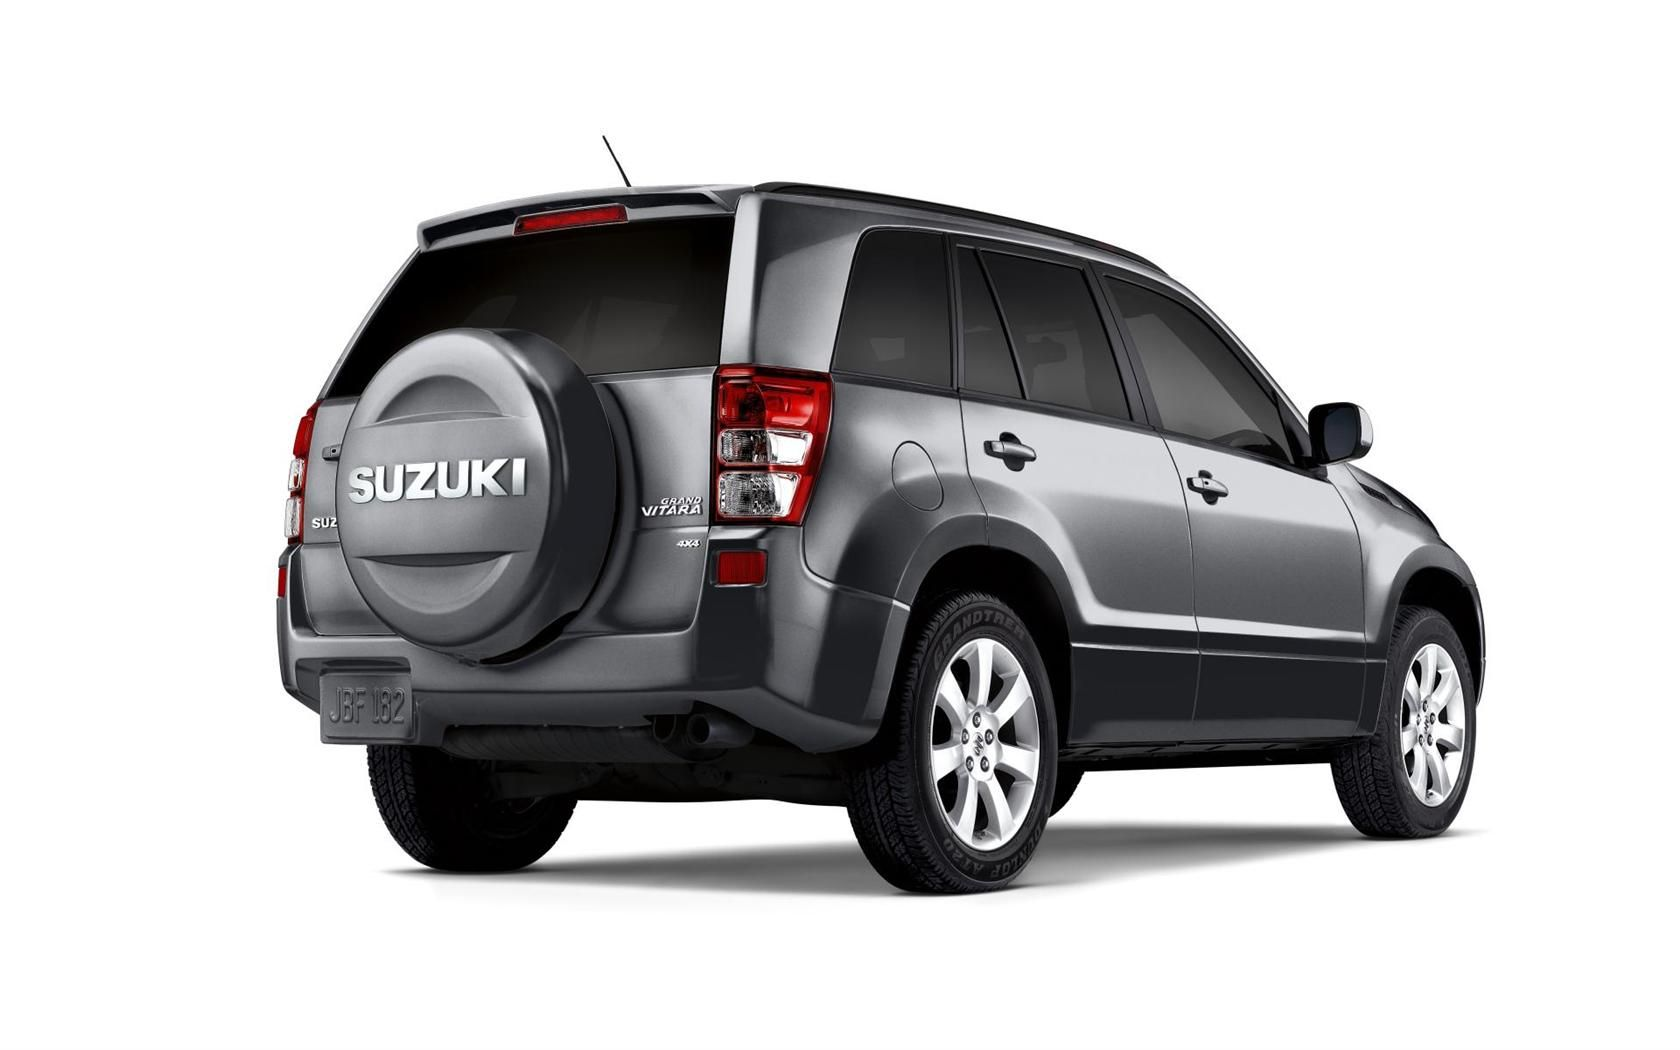 Suzuki Grand Vitara Ii 2012 Images 68918 Jpg 1680 1050 Mobil